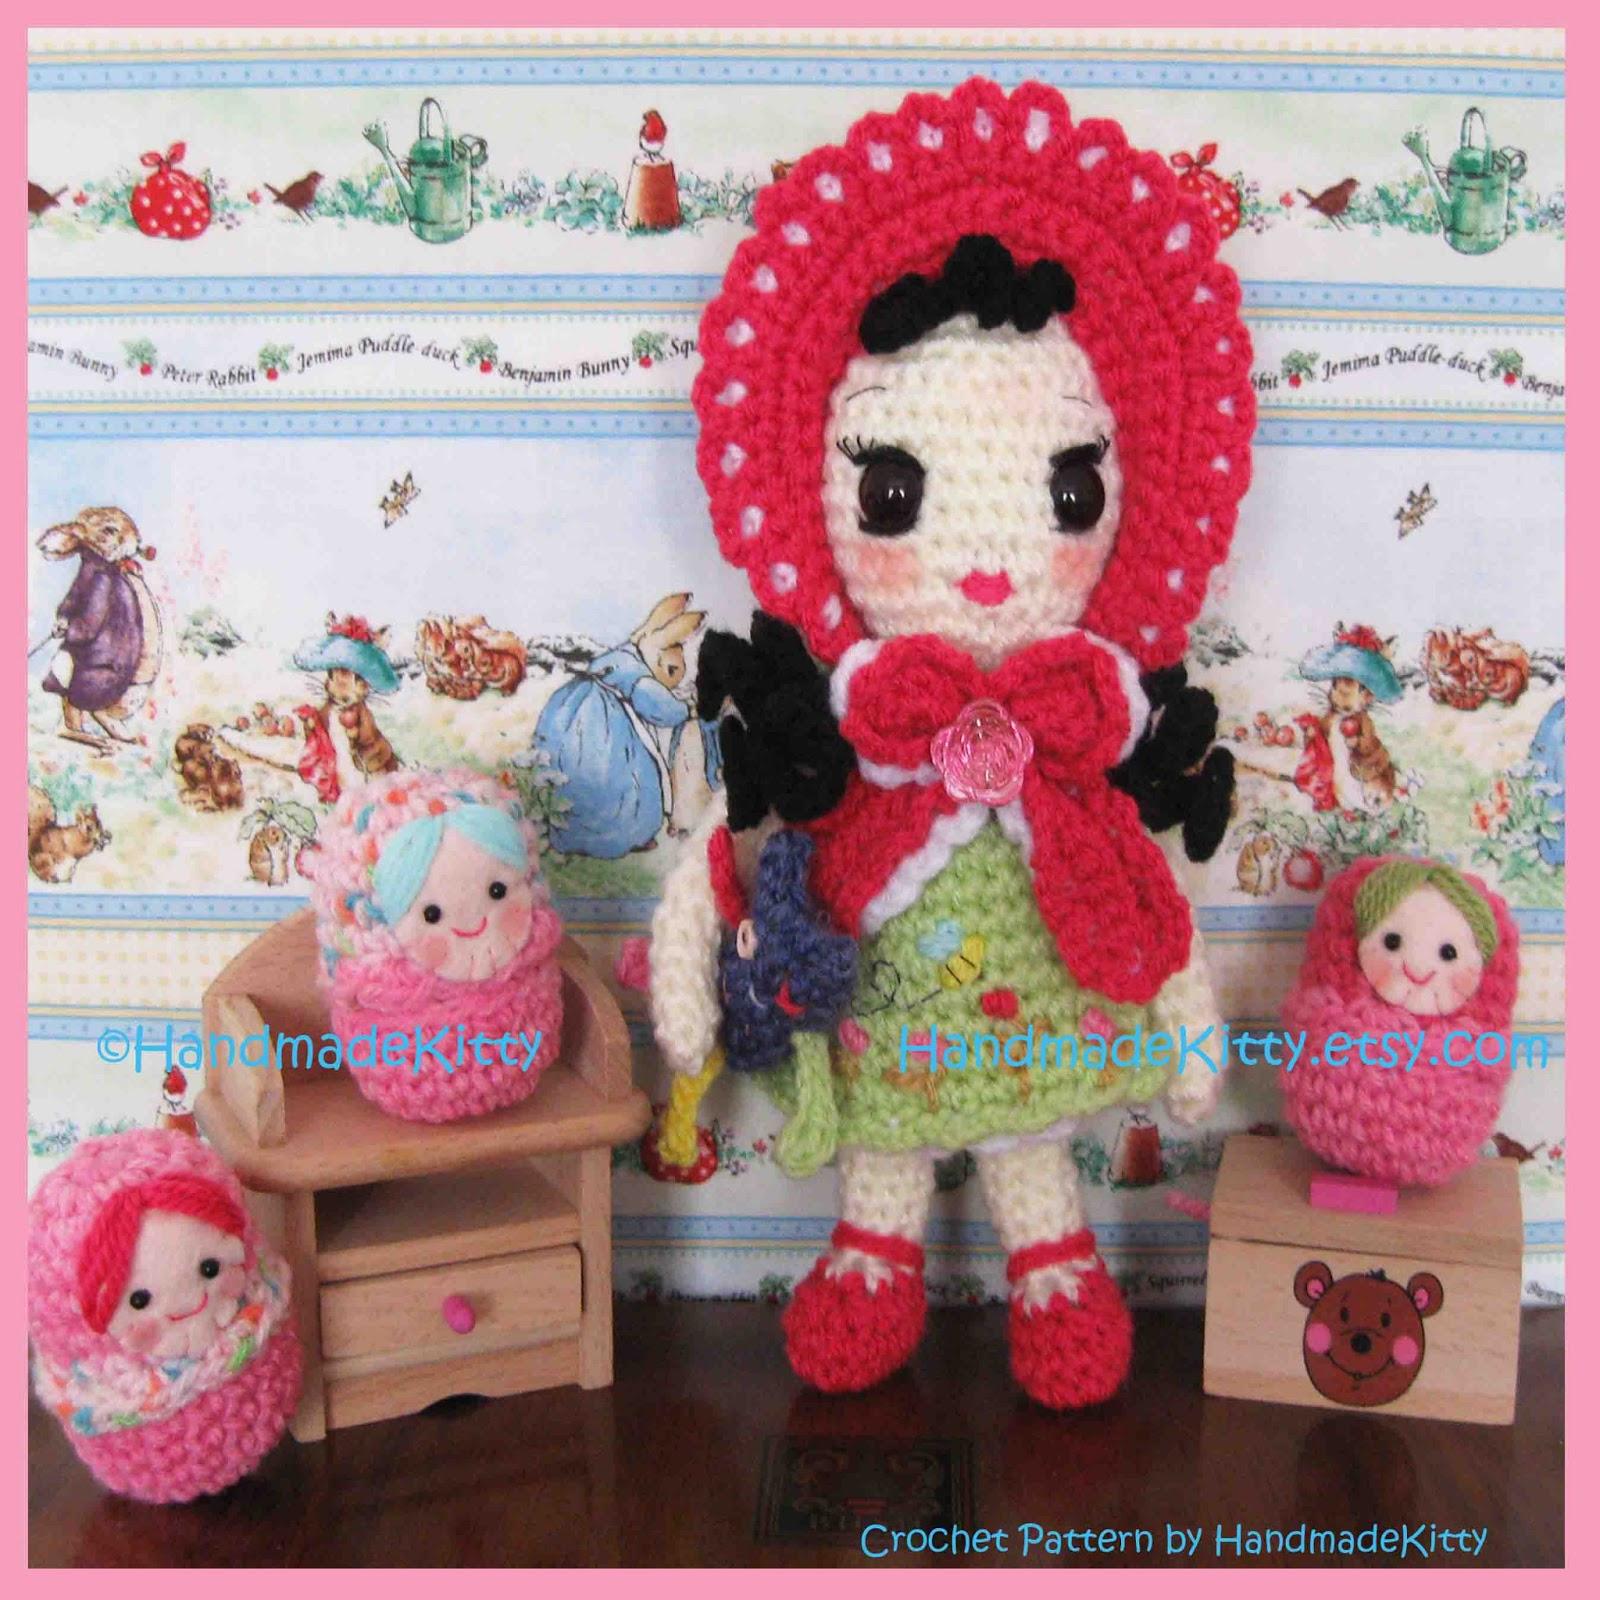 HandmadeKitty: Boomii Doll Amigurumi Crochet Pattern by ...